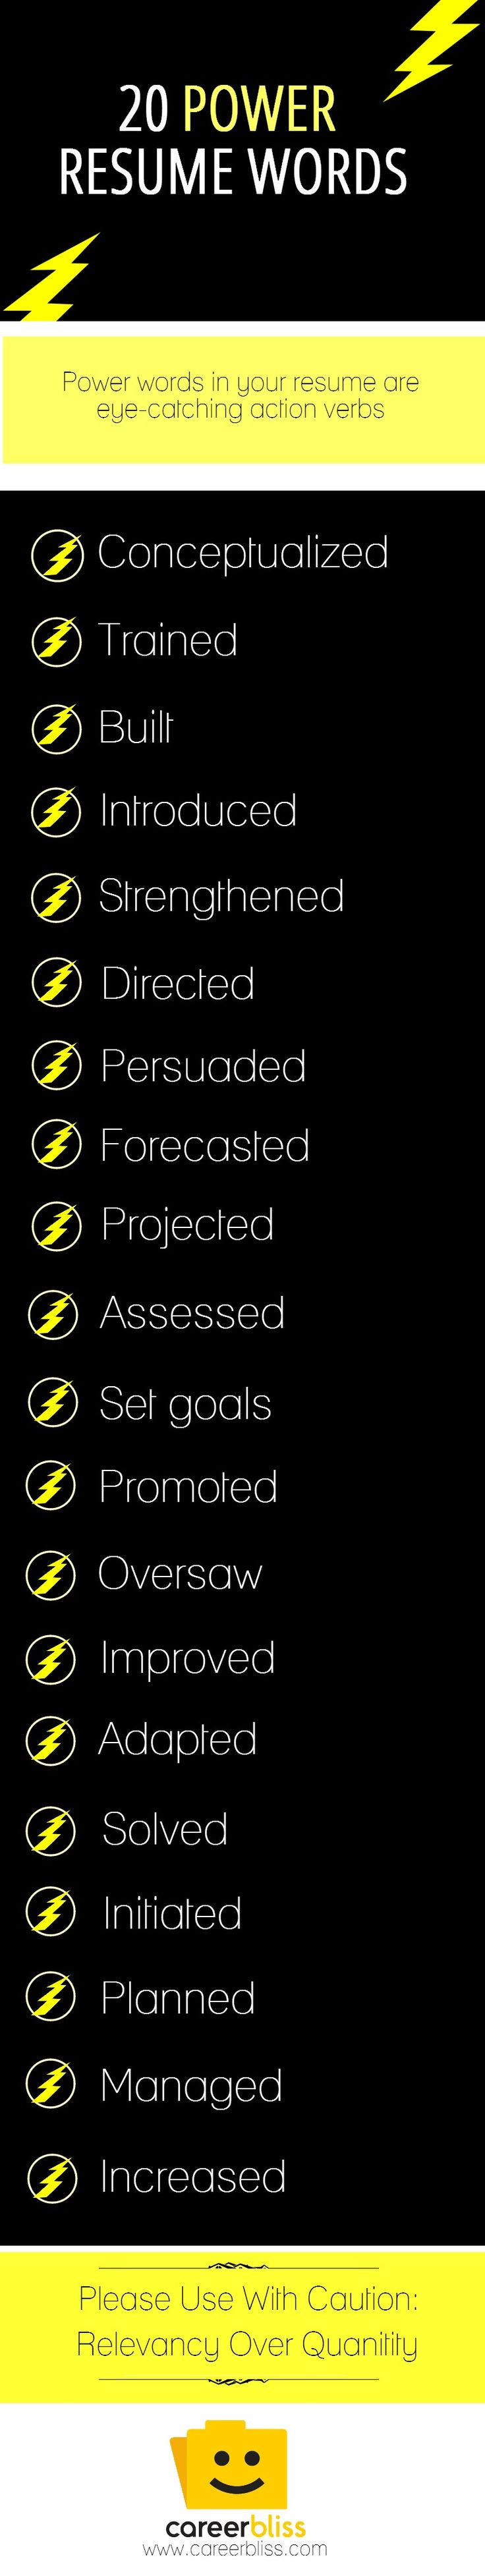 20 Resume Power Words Infographic Career Pinterest